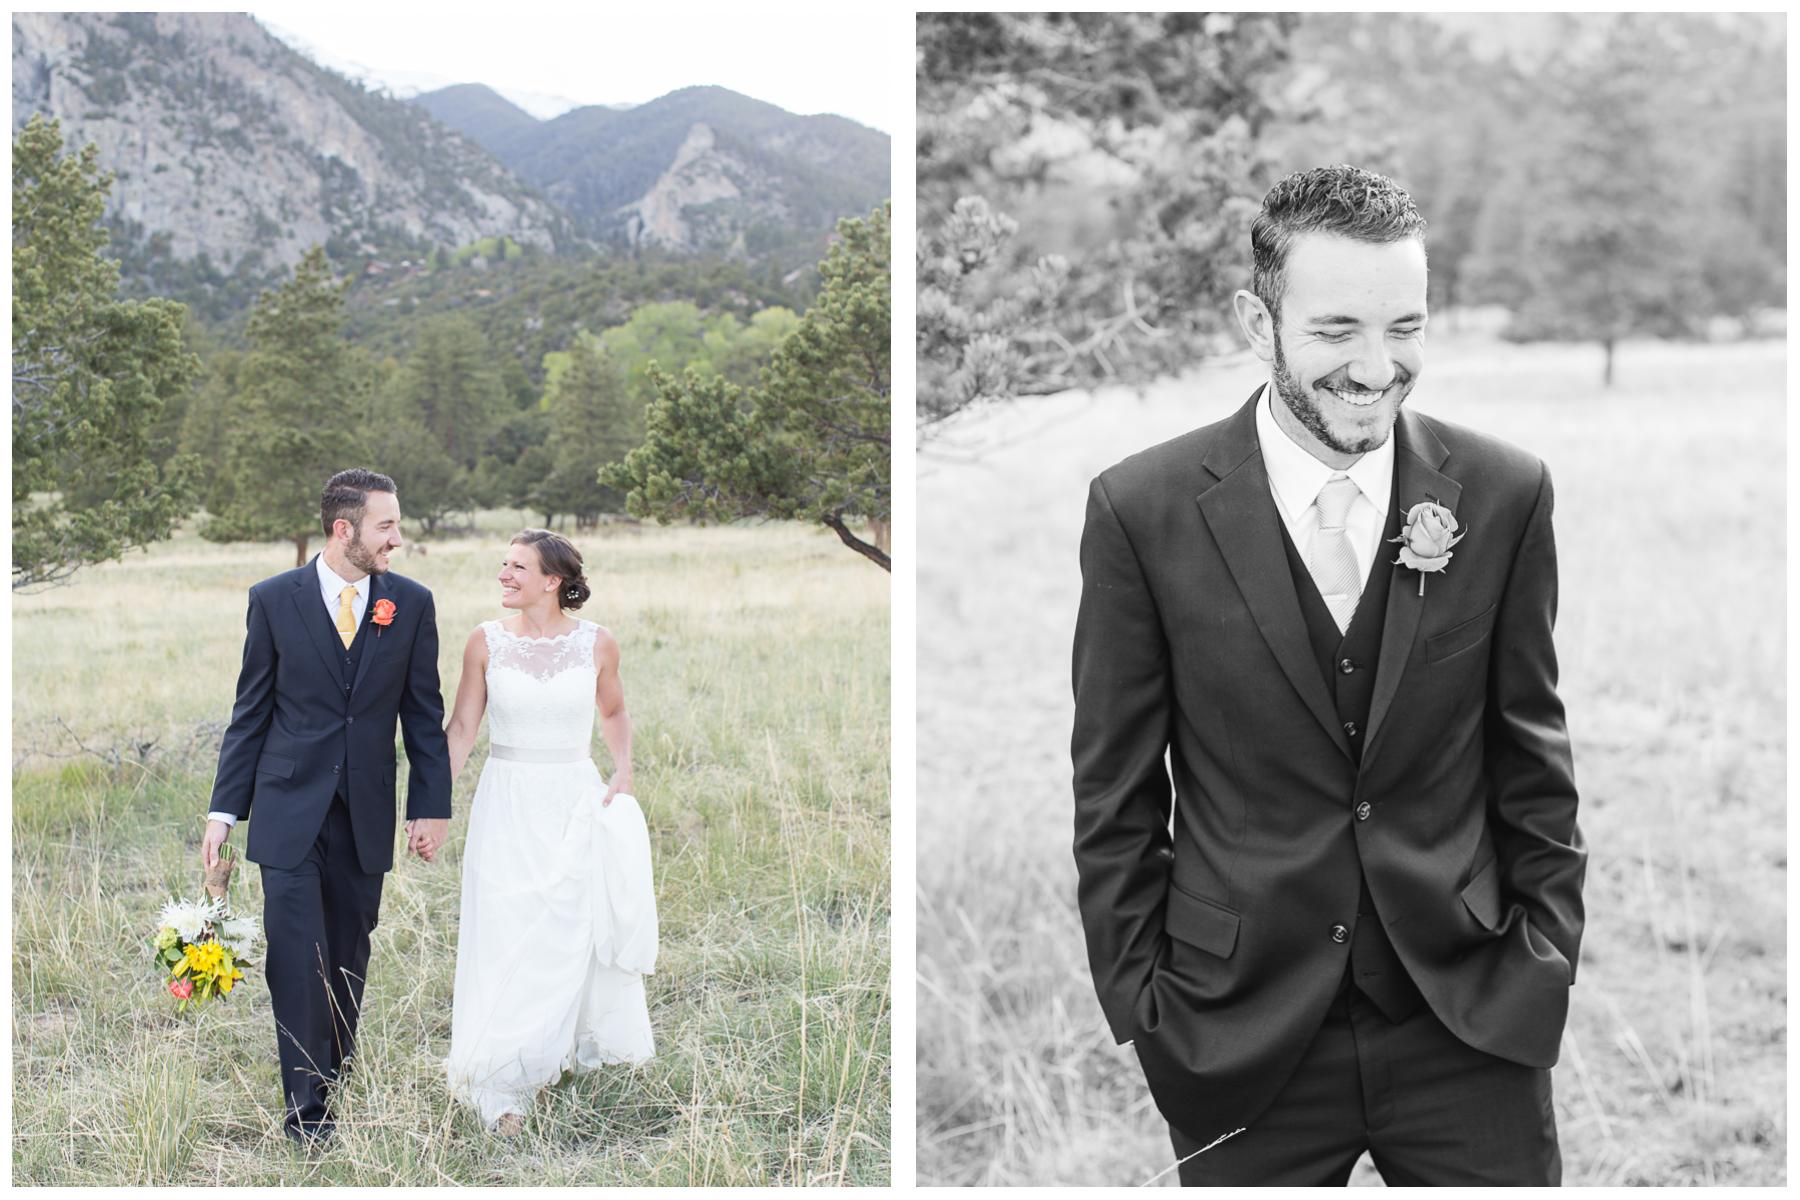 Thompson Wedding 16.jpg